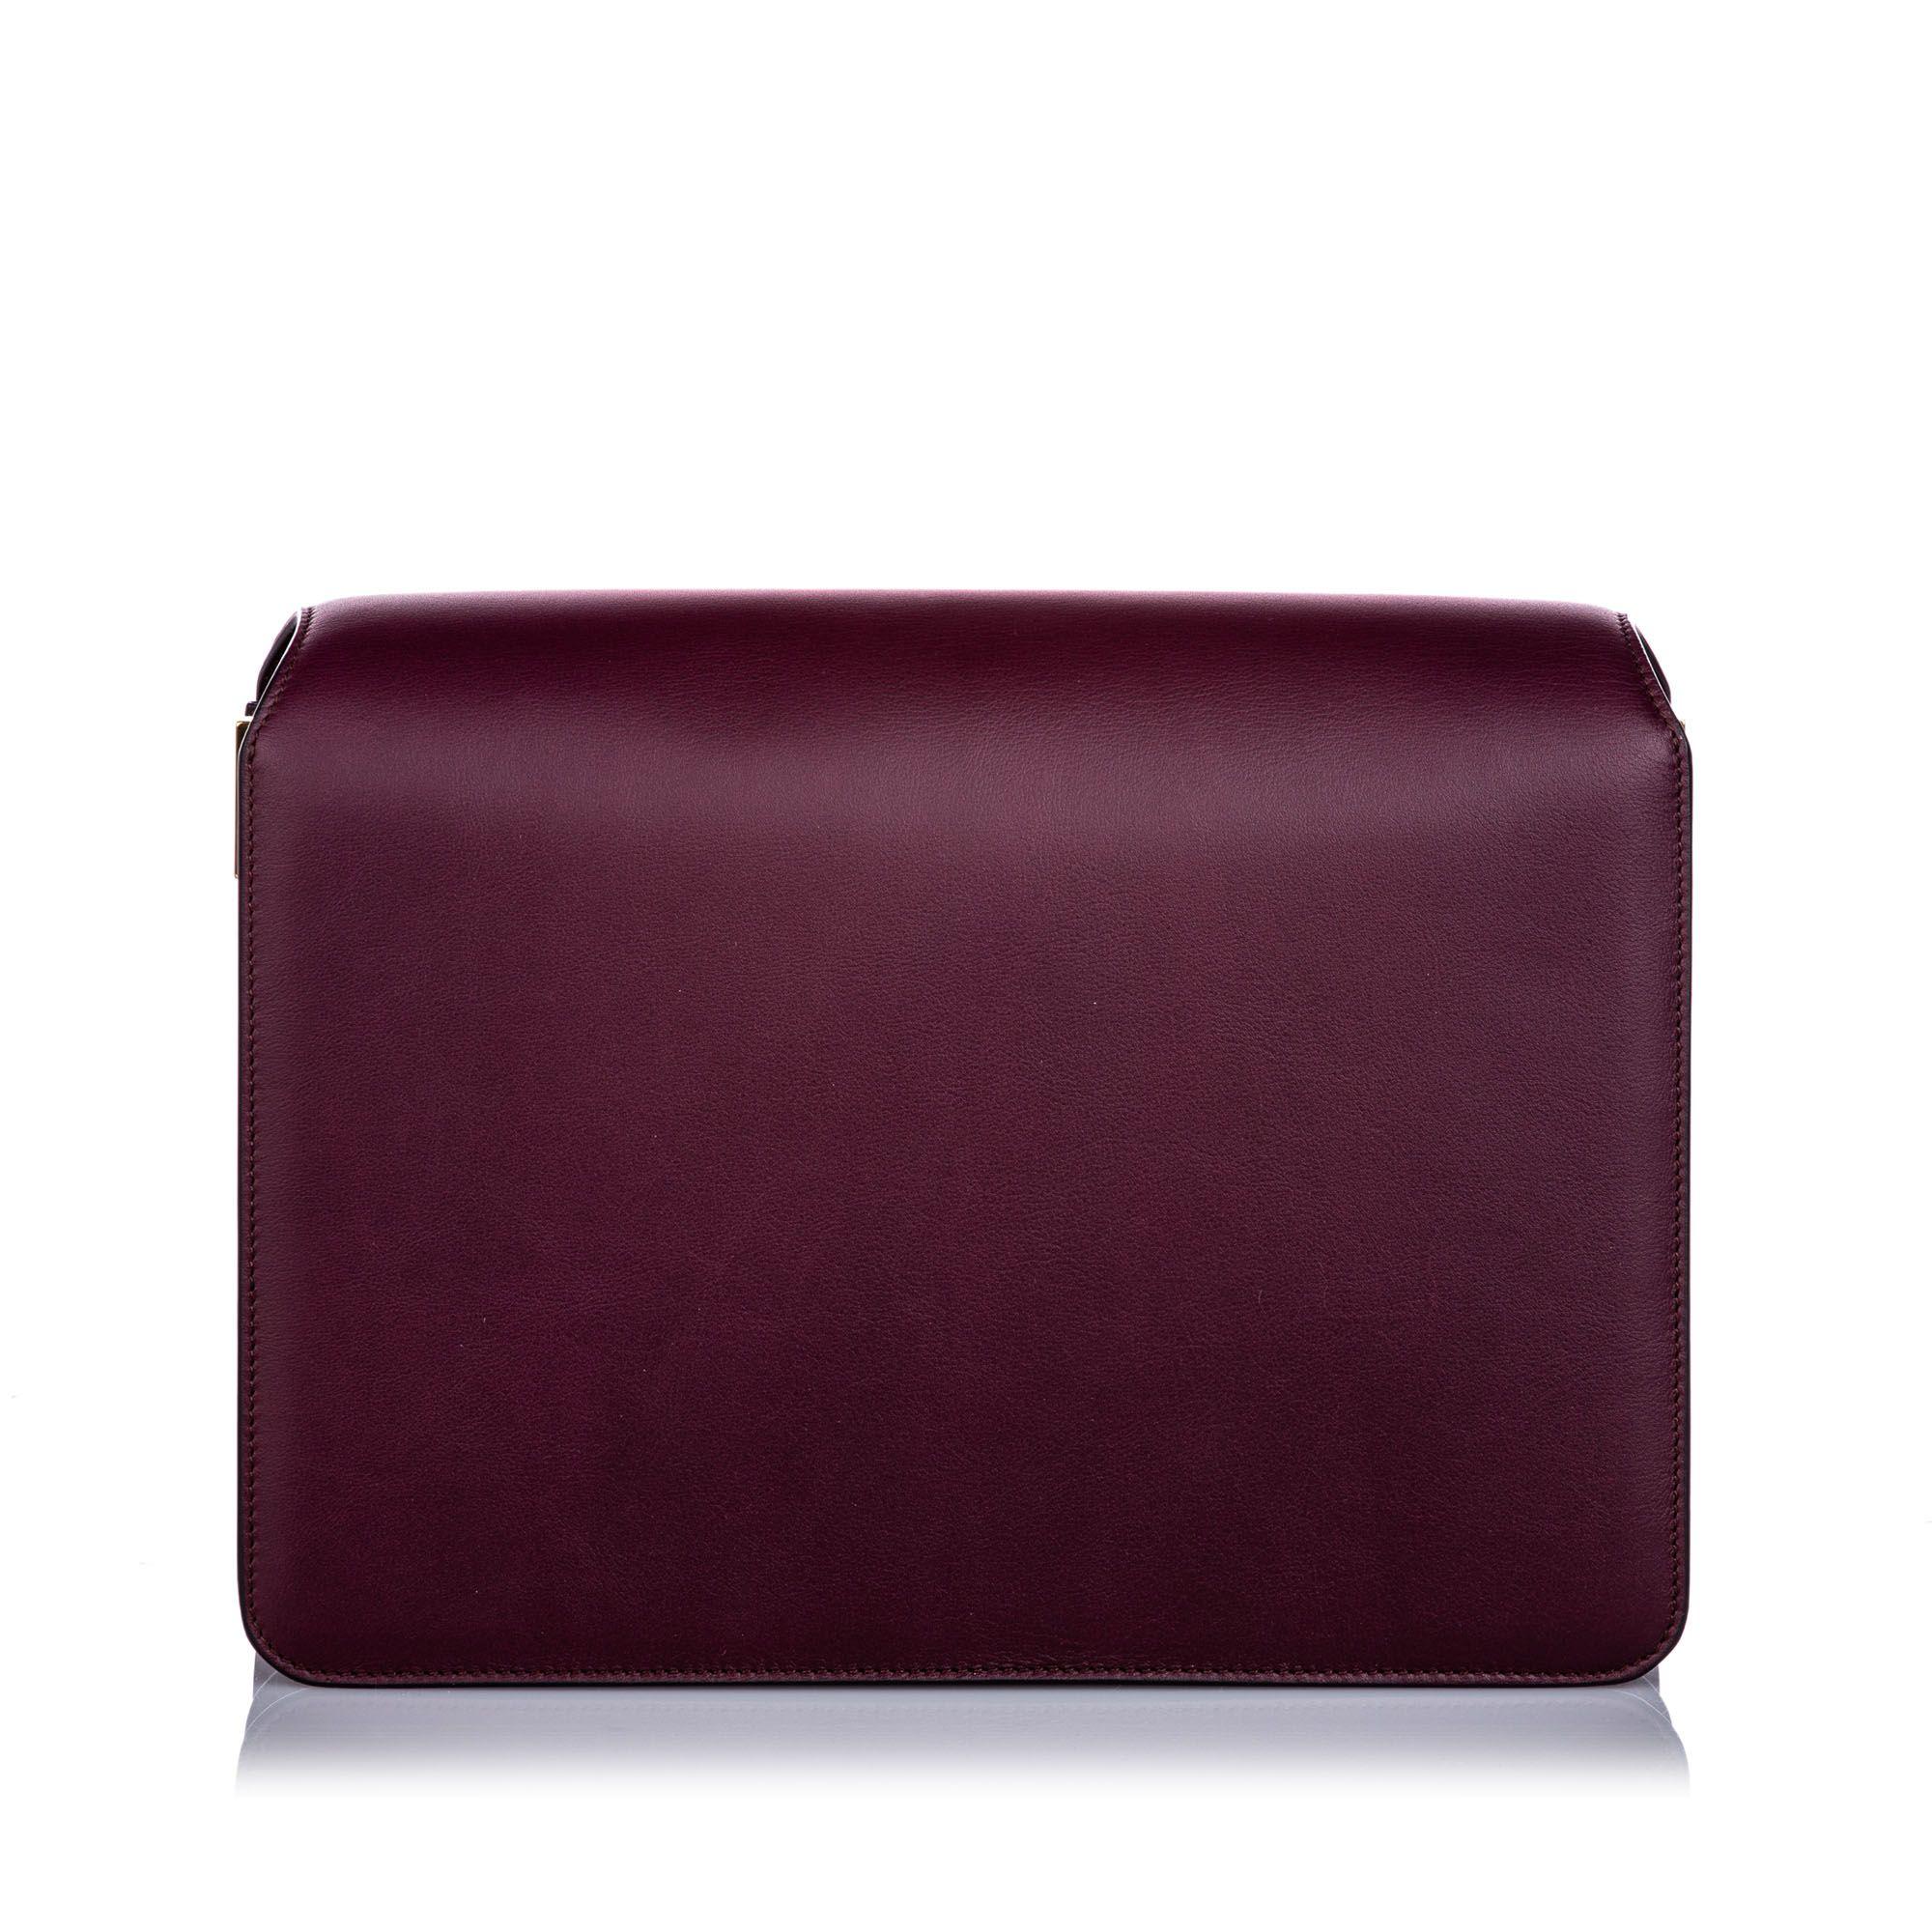 Vintage Ferragamo Calfskin Gancini Flap Bag Red